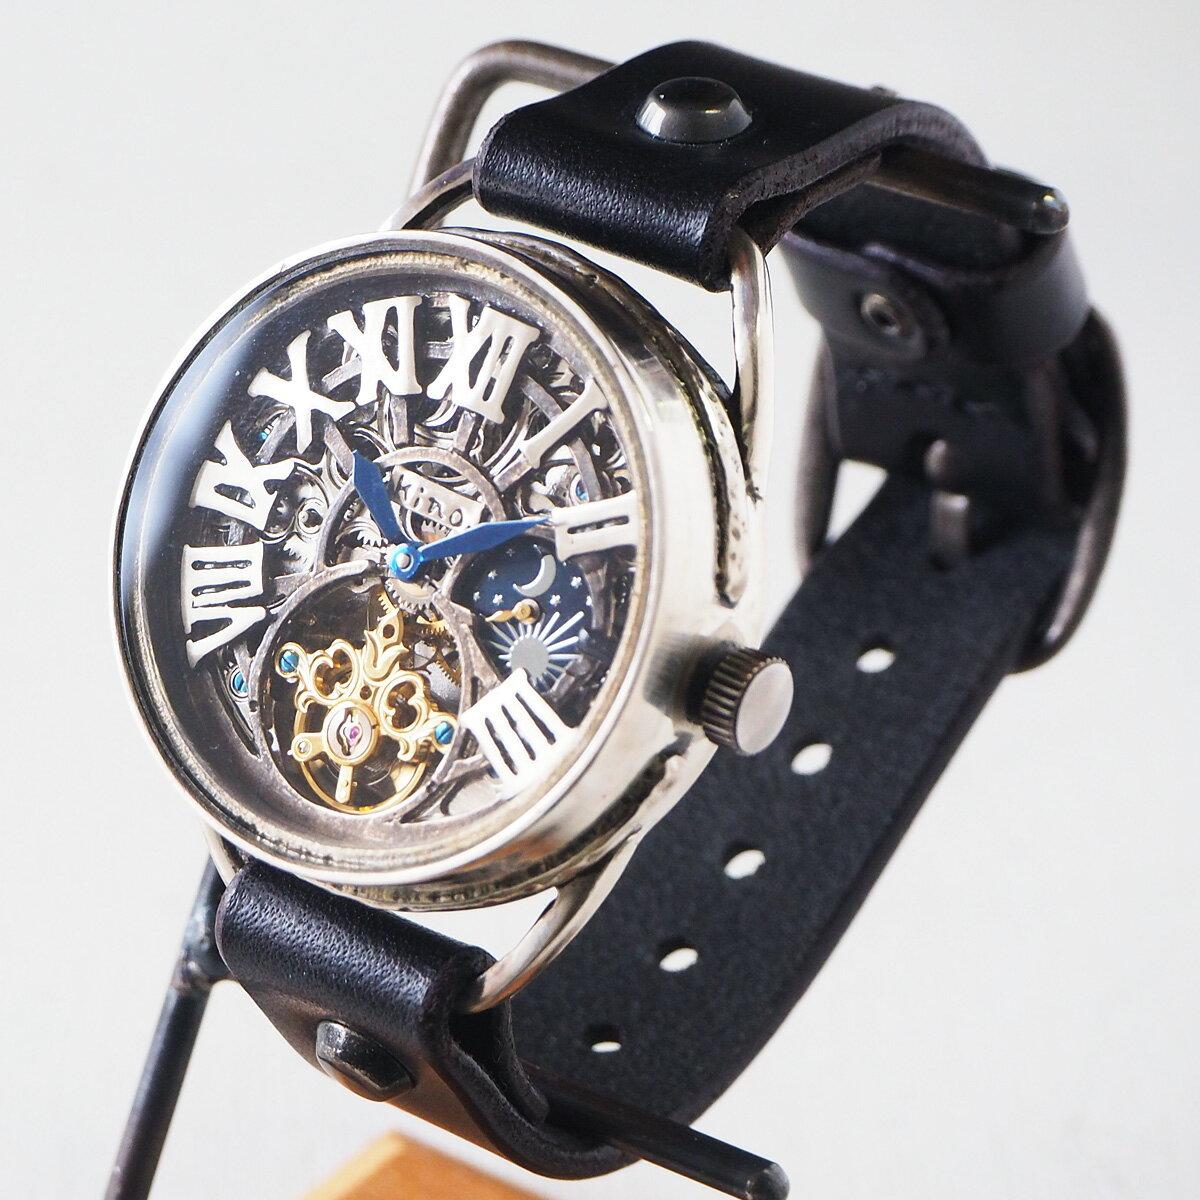 KINO(キノ) 手作り腕時計 自動巻き 裏スケルトン クラウン SUN&MOON シルバー [K-11-SV] 時計作家 木野内芳祐 機械式ハンドメイドウォッチ ハンドメイド腕時計 両面スケルトン メンズ レディース イタリア牛革 シルバー カジュアル 日本製 精密